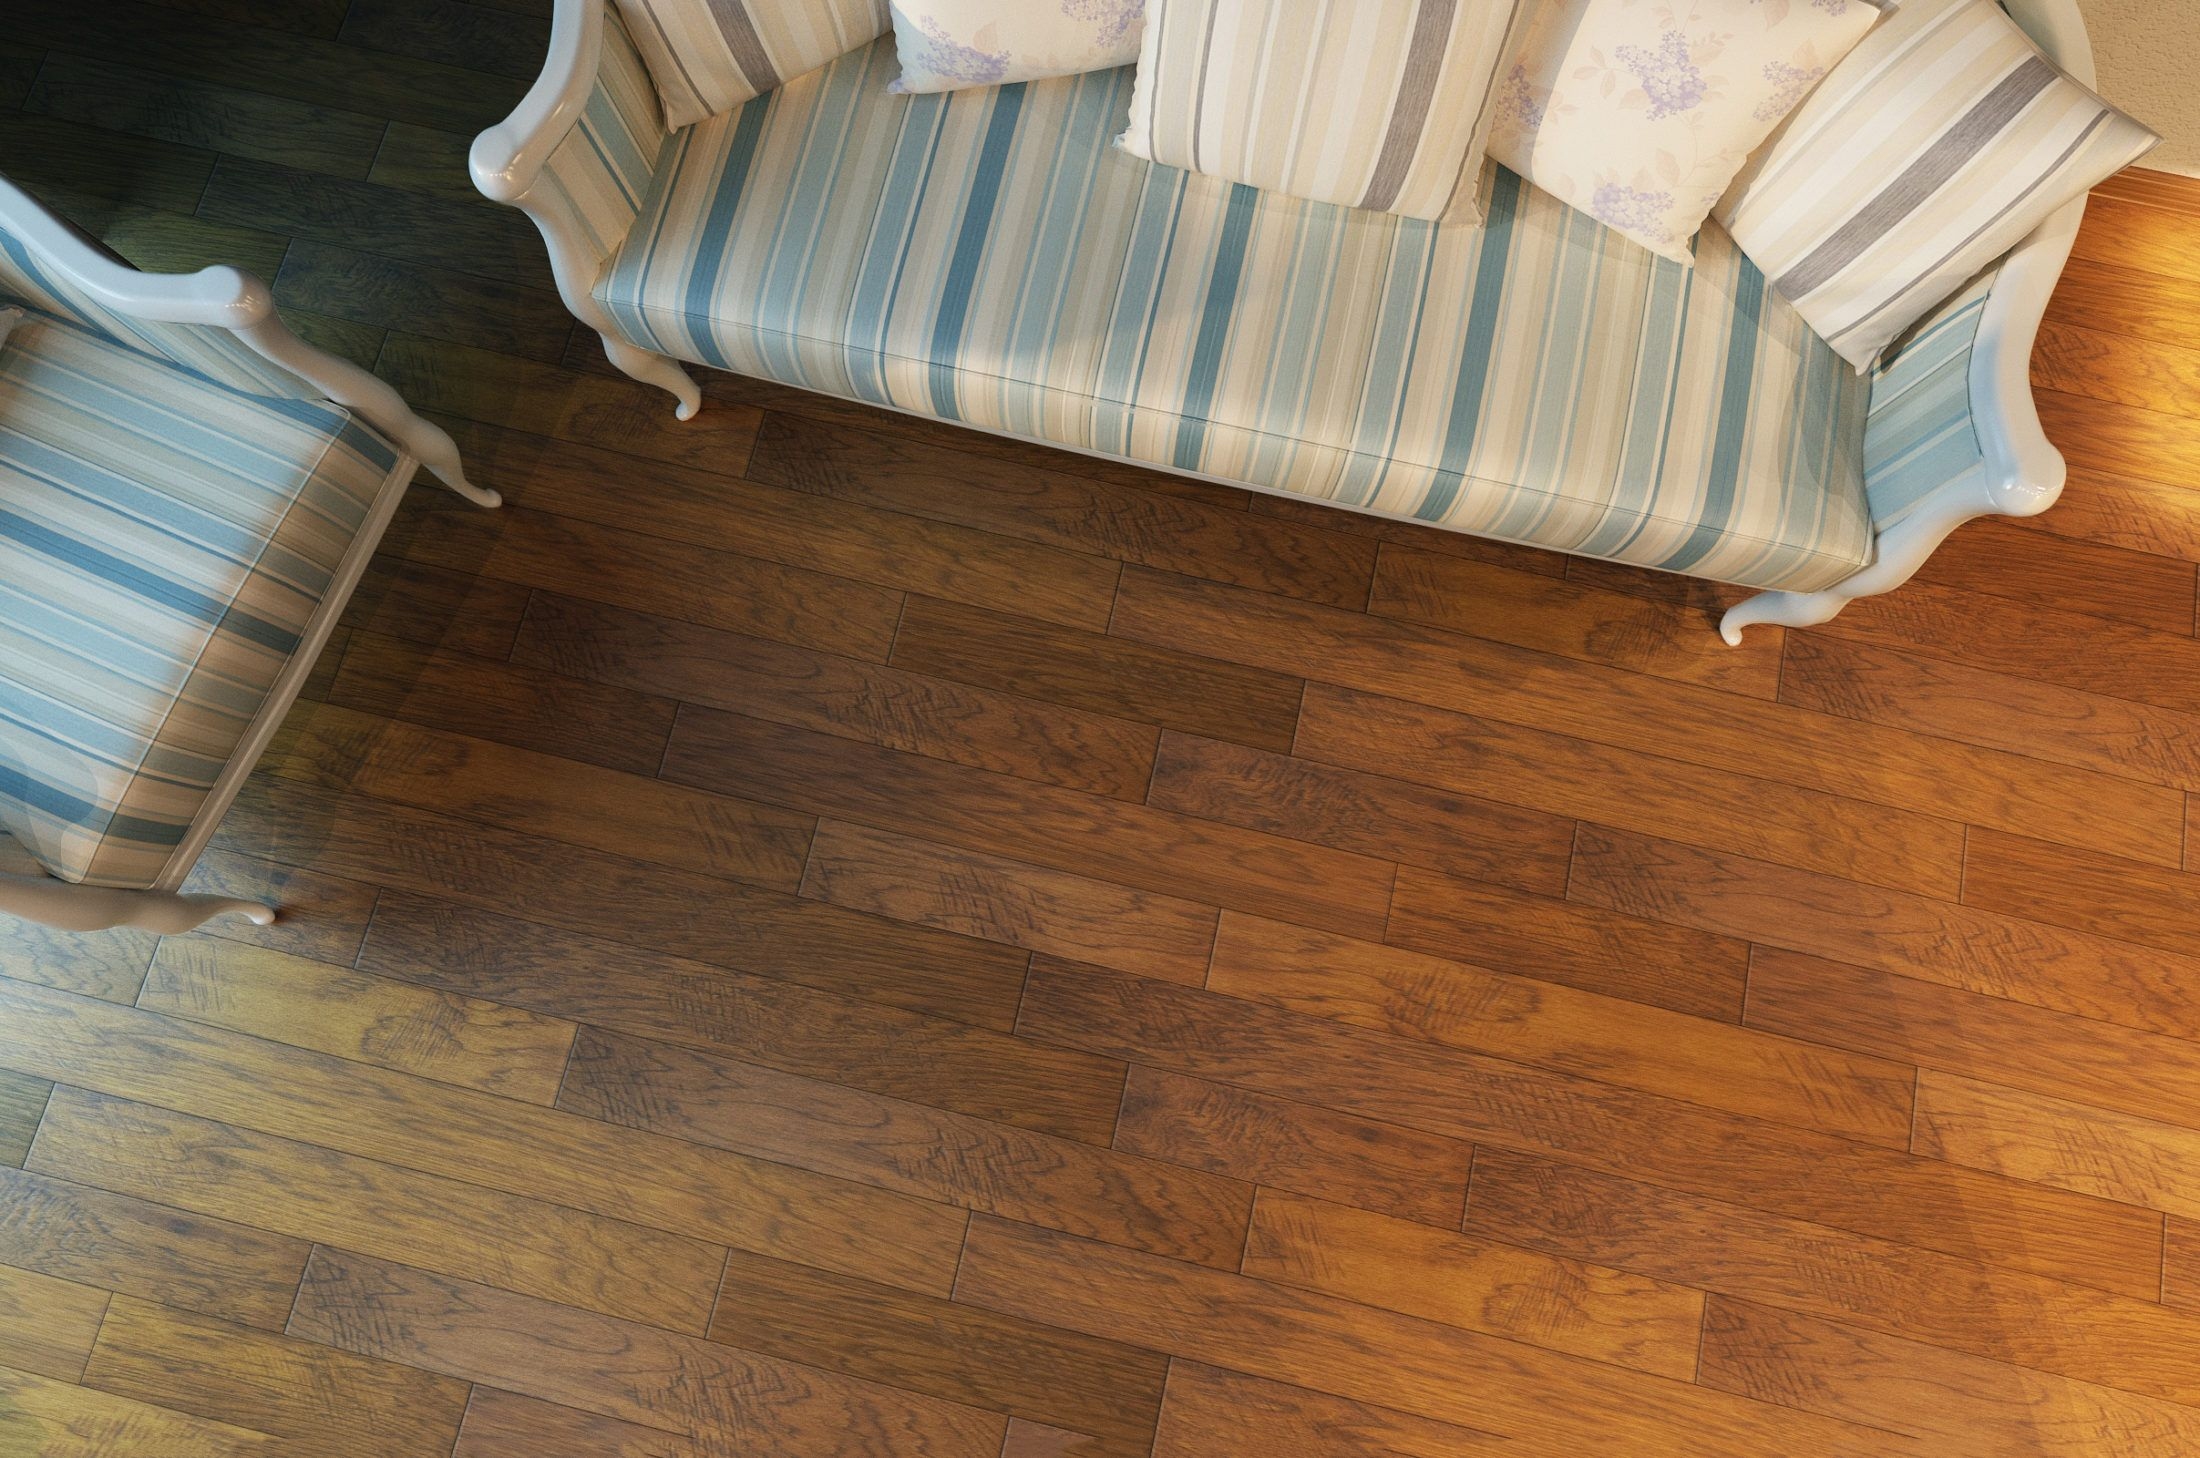 5 X 1 2 Hickory Prairie Engineered Schillings Engineered Flooring Flooring Hardwood